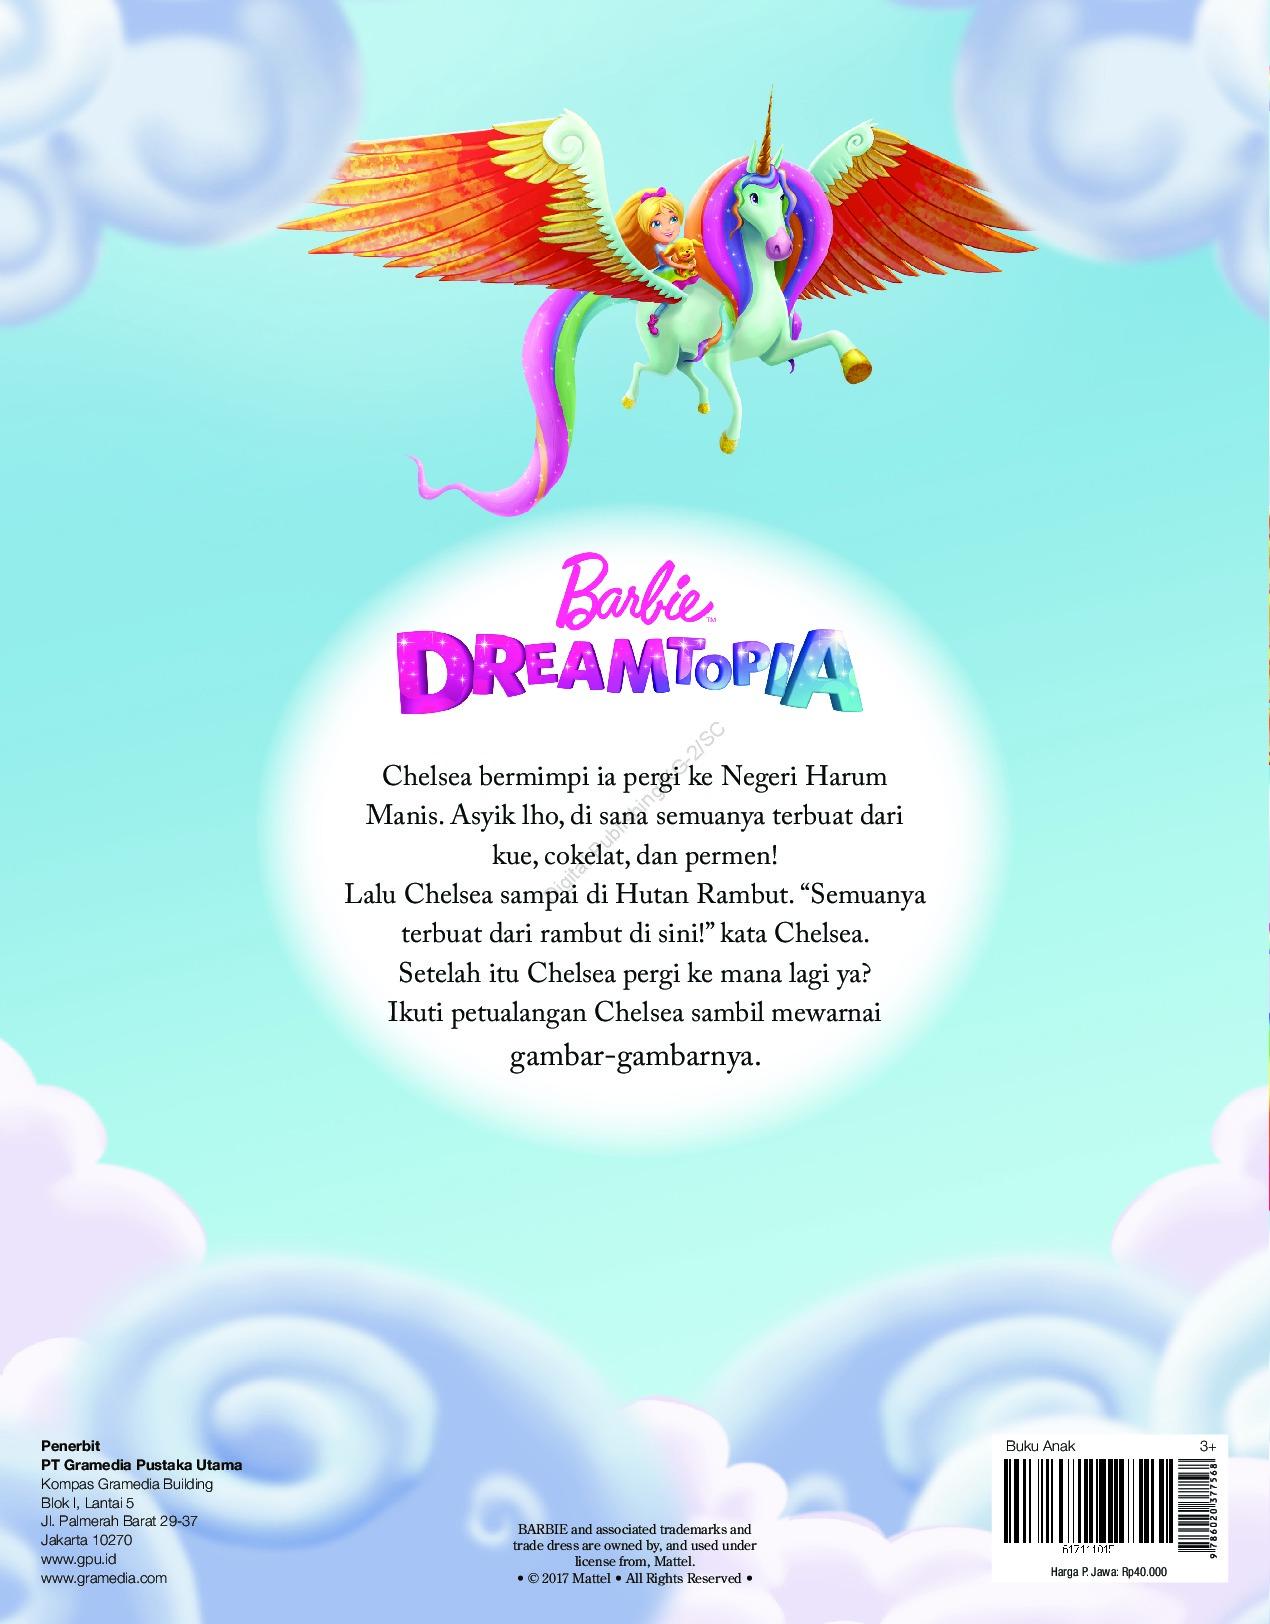 Jual Buku Barbie Dreamtopia Buku Cerita Mewarnai Dan Permainan